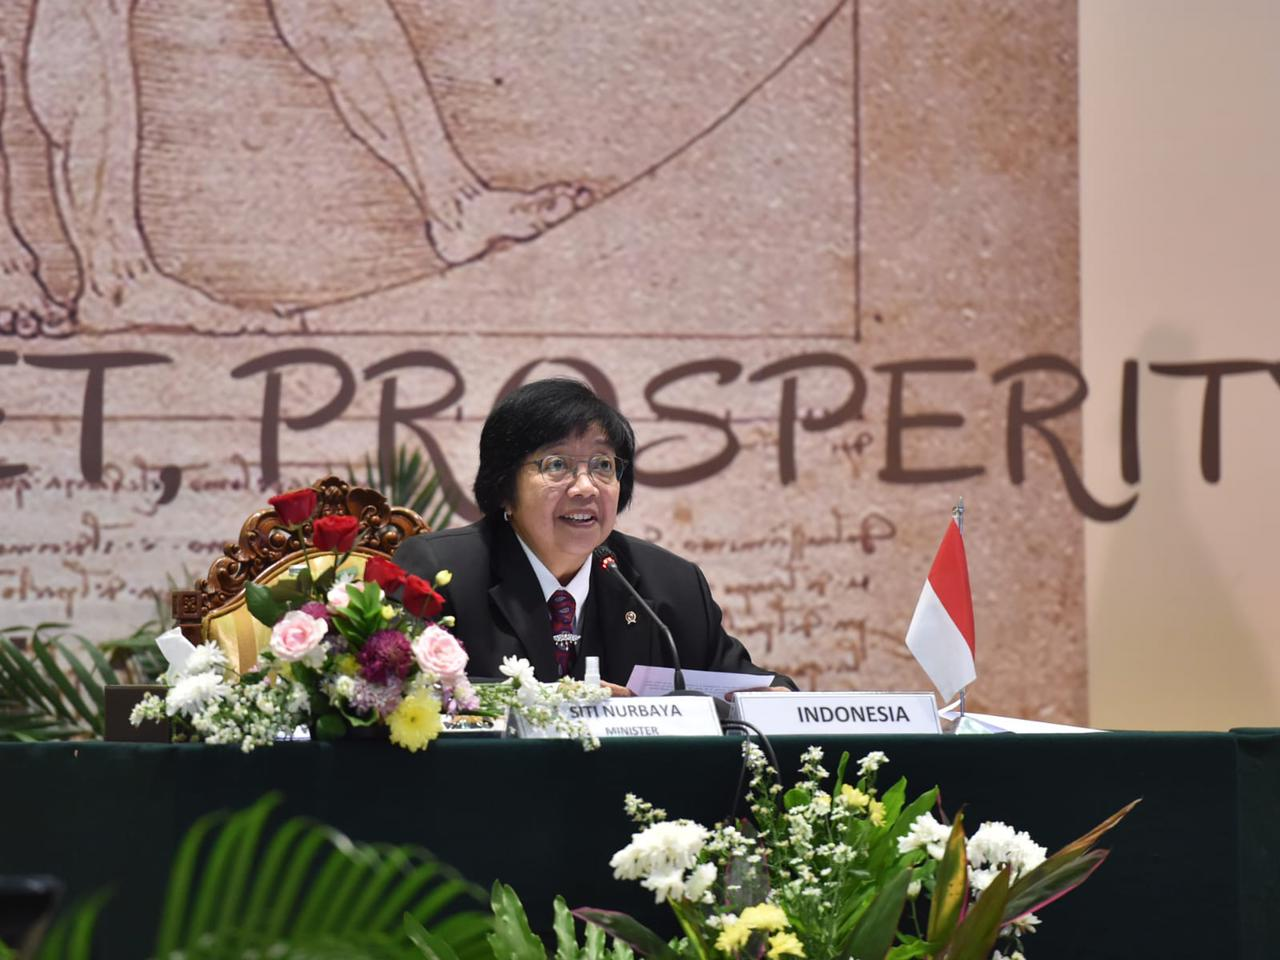 Menteri Siti Paparkan Pembangunan Kota Ramah Lingkungan untuk Kendalikan Perubahan Iklim pada Ministerial Meeting G20